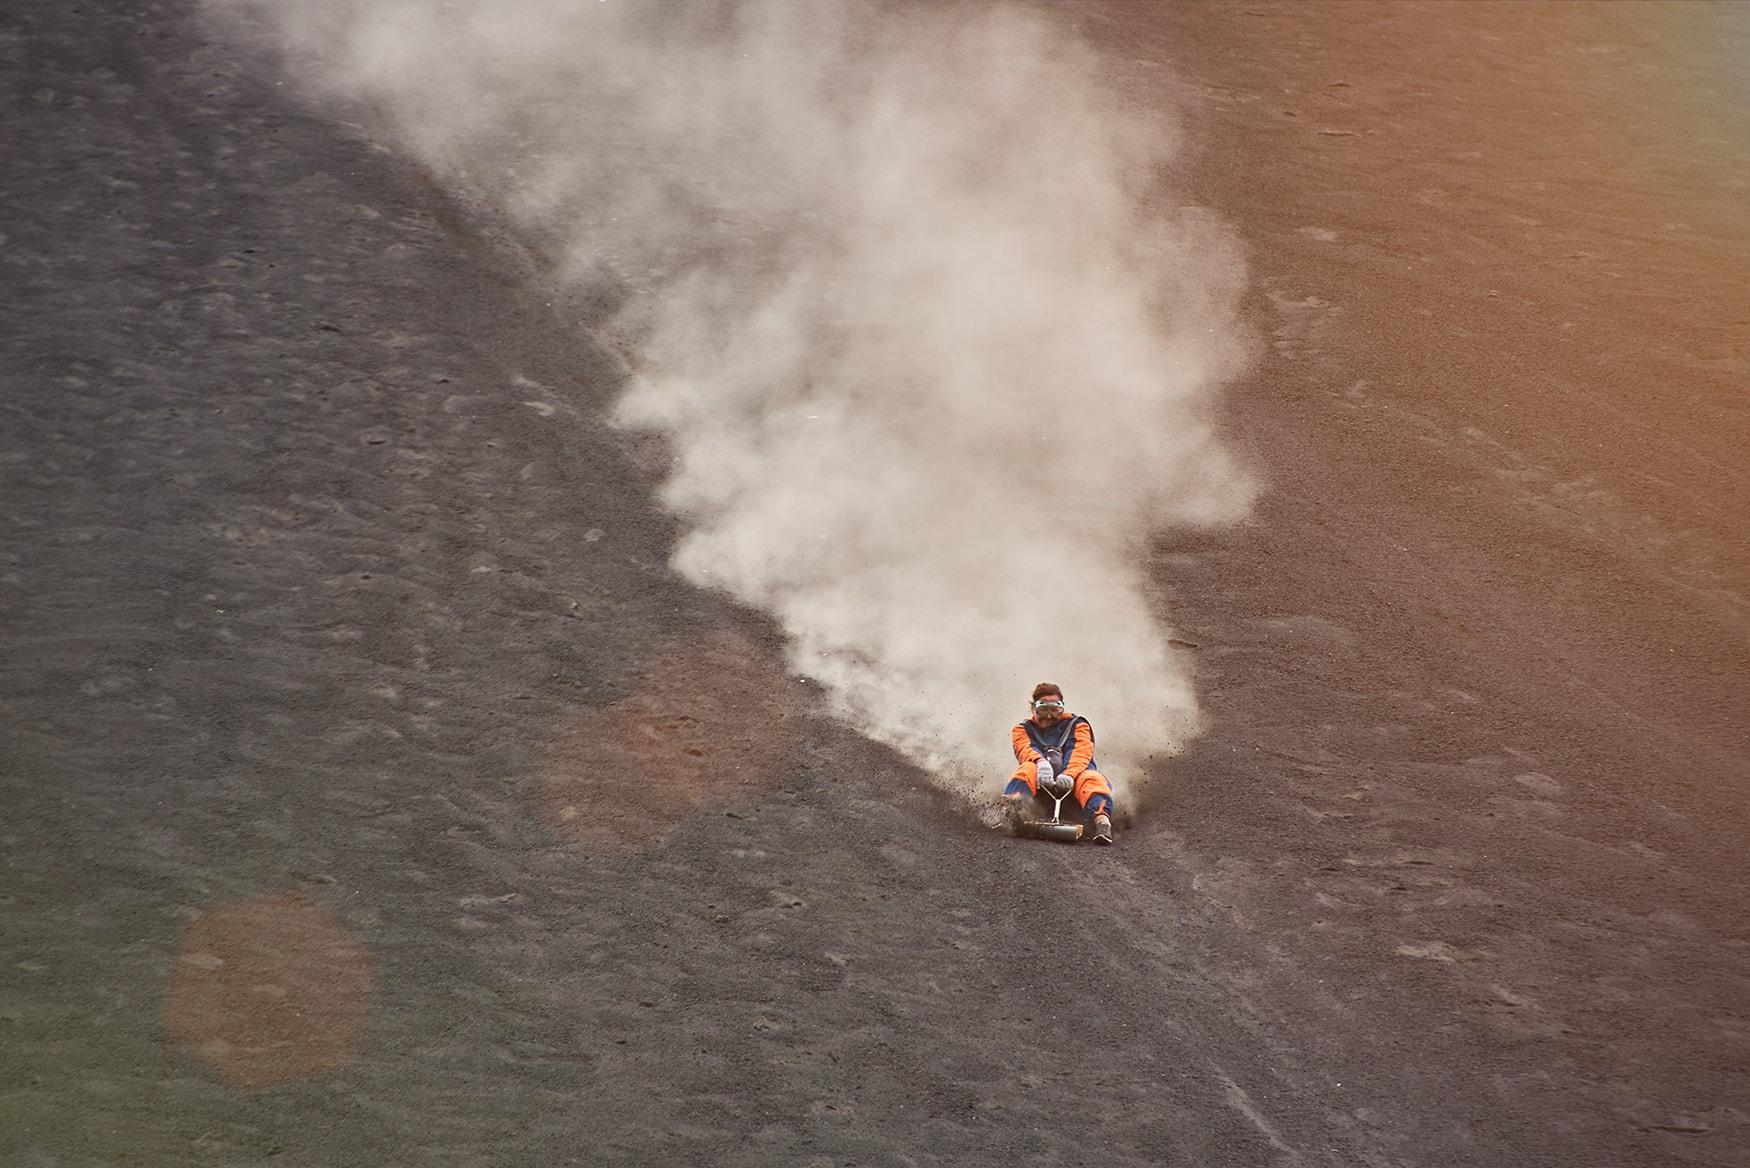 Frau beim Volcano Boarding auf demCerro Negro